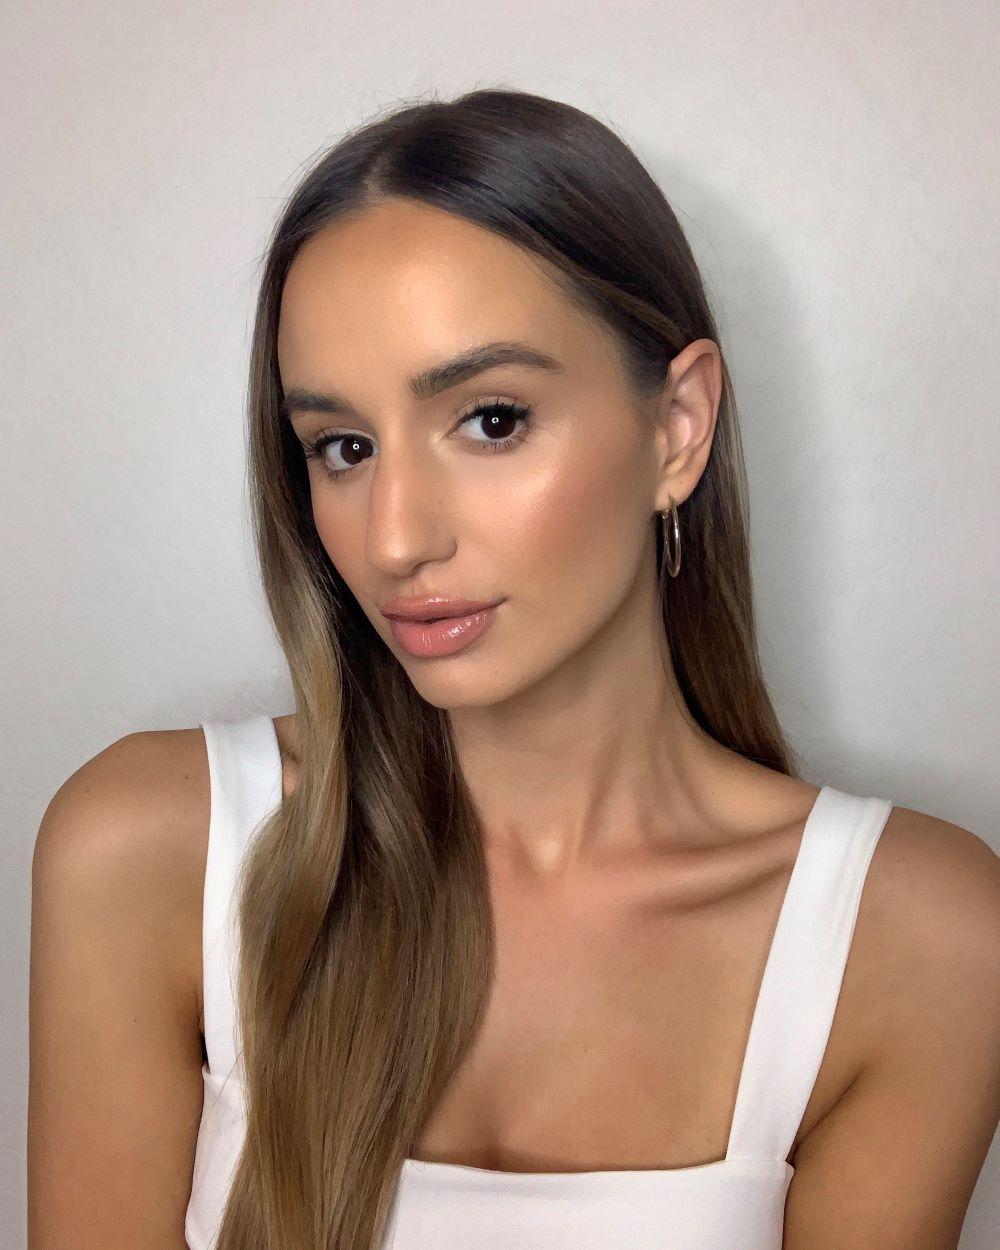 Pretty and Easy Graduation Makeup   Graduation Makeup Tutorials by http://www.makeuptutorials.com/makeup-tutorials-graduation-beauty-ideas